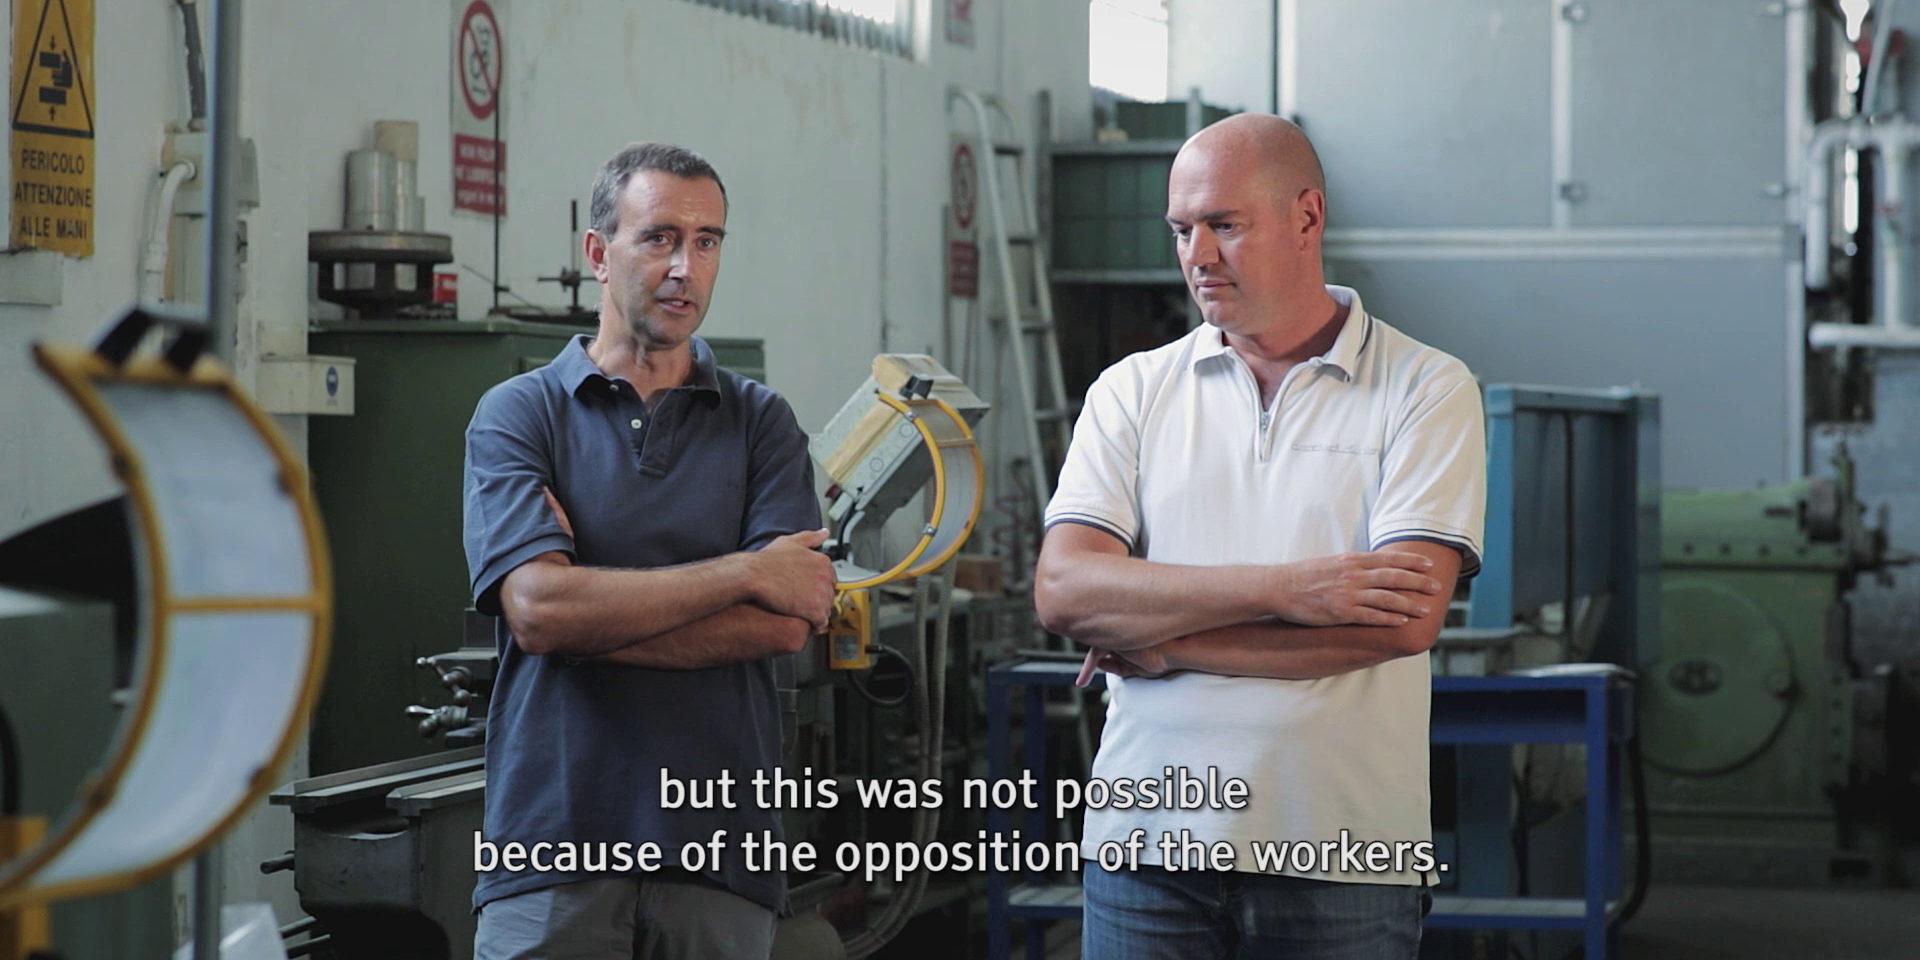 CANTIERI DI PISA – Promotional Documentary